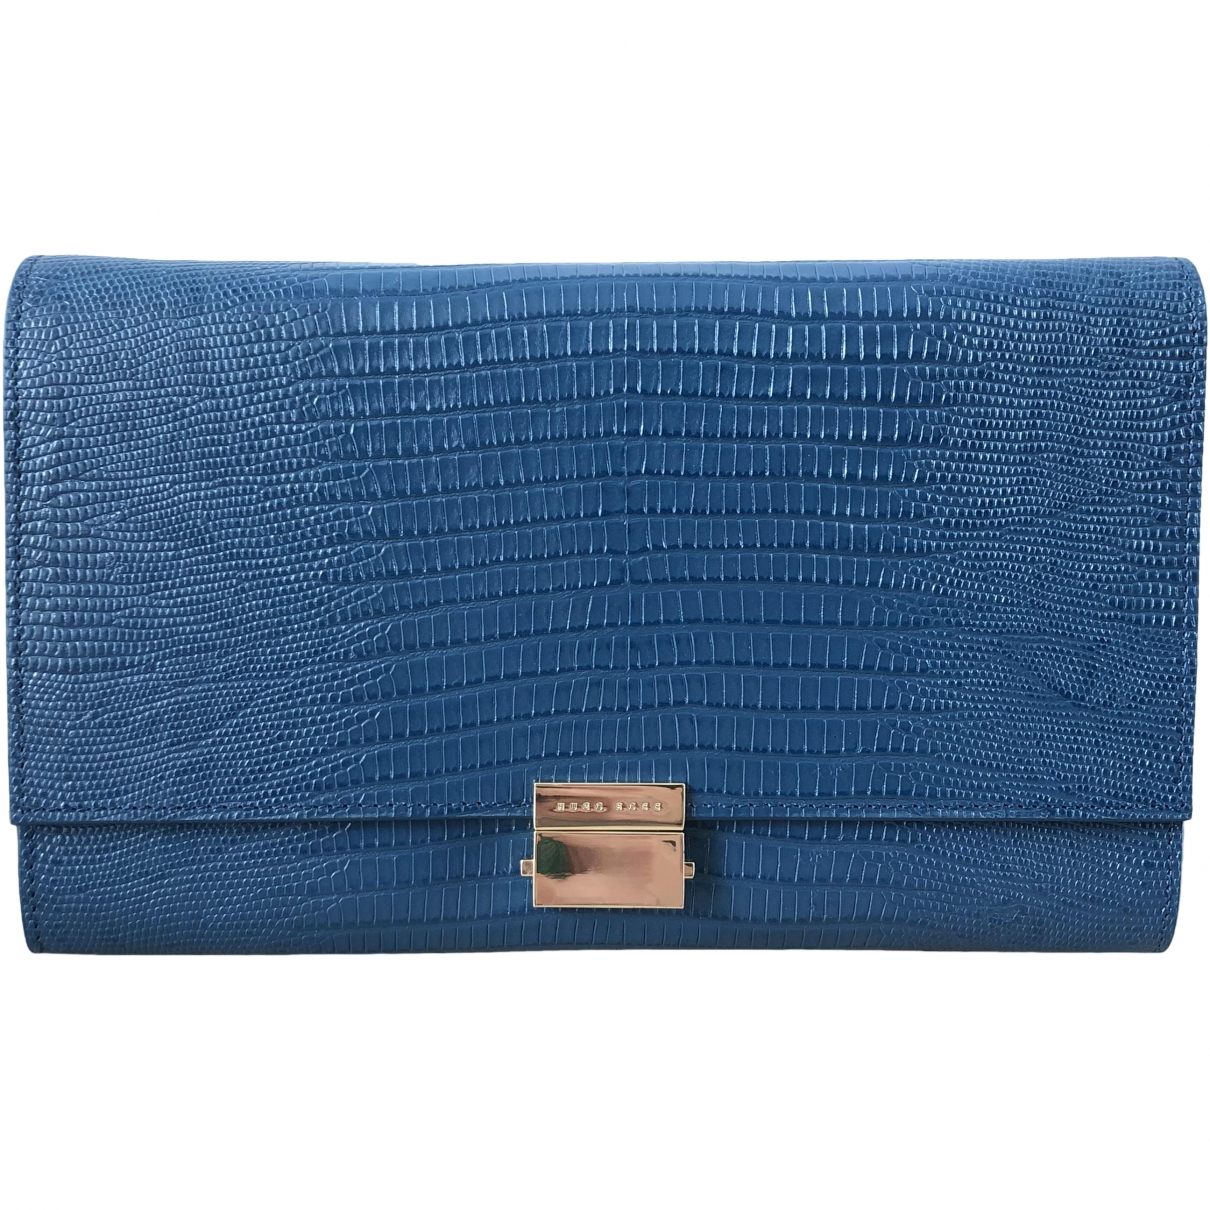 Boss \N Blue Leather Clutch bag for Women \N